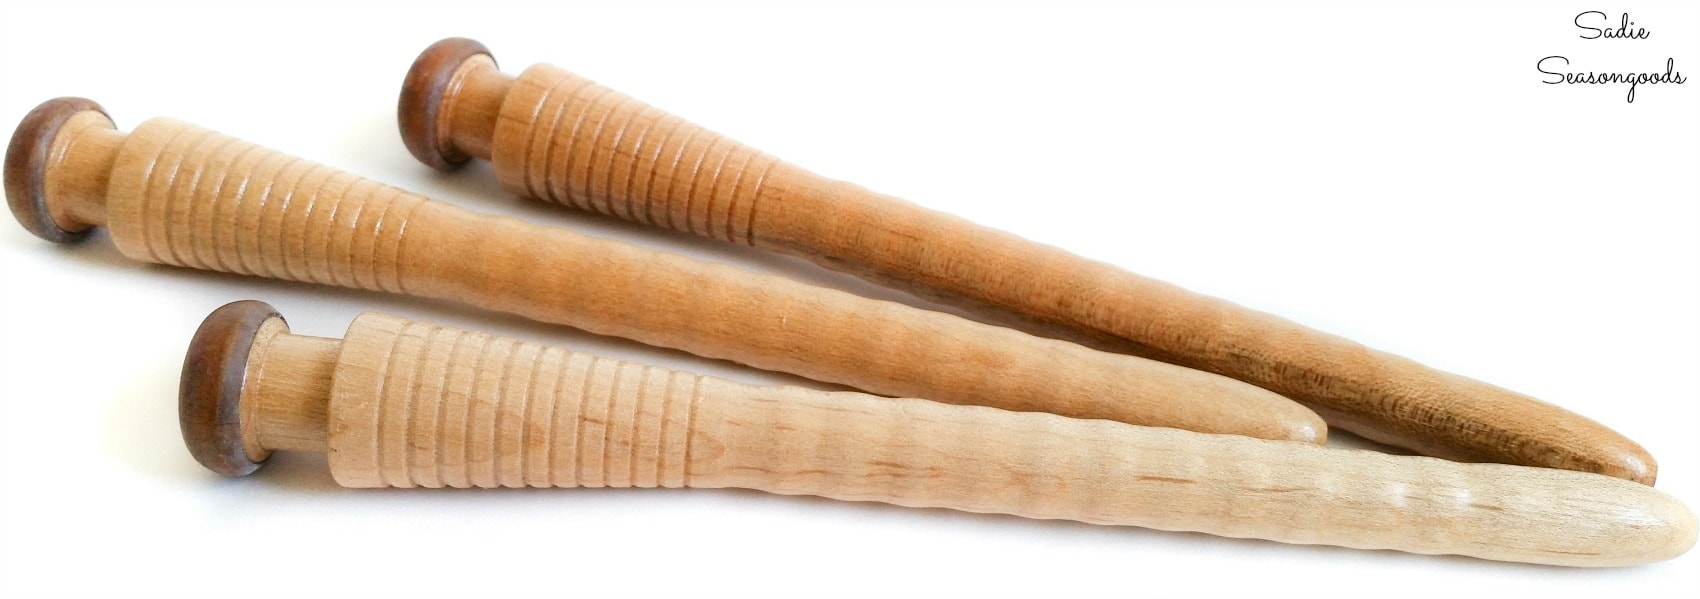 Weaving bobbins or pirns